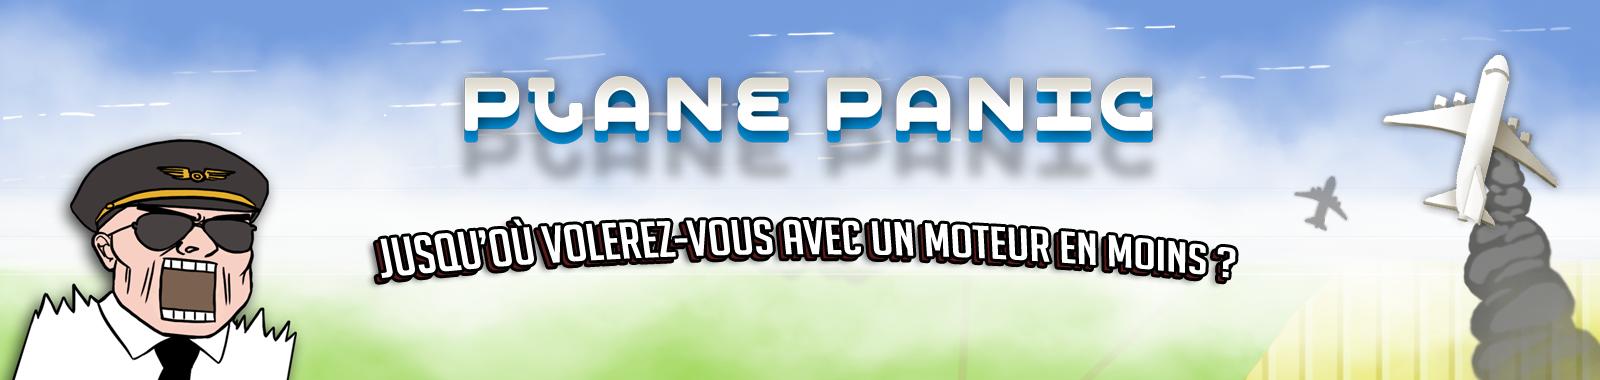 PlanePanic